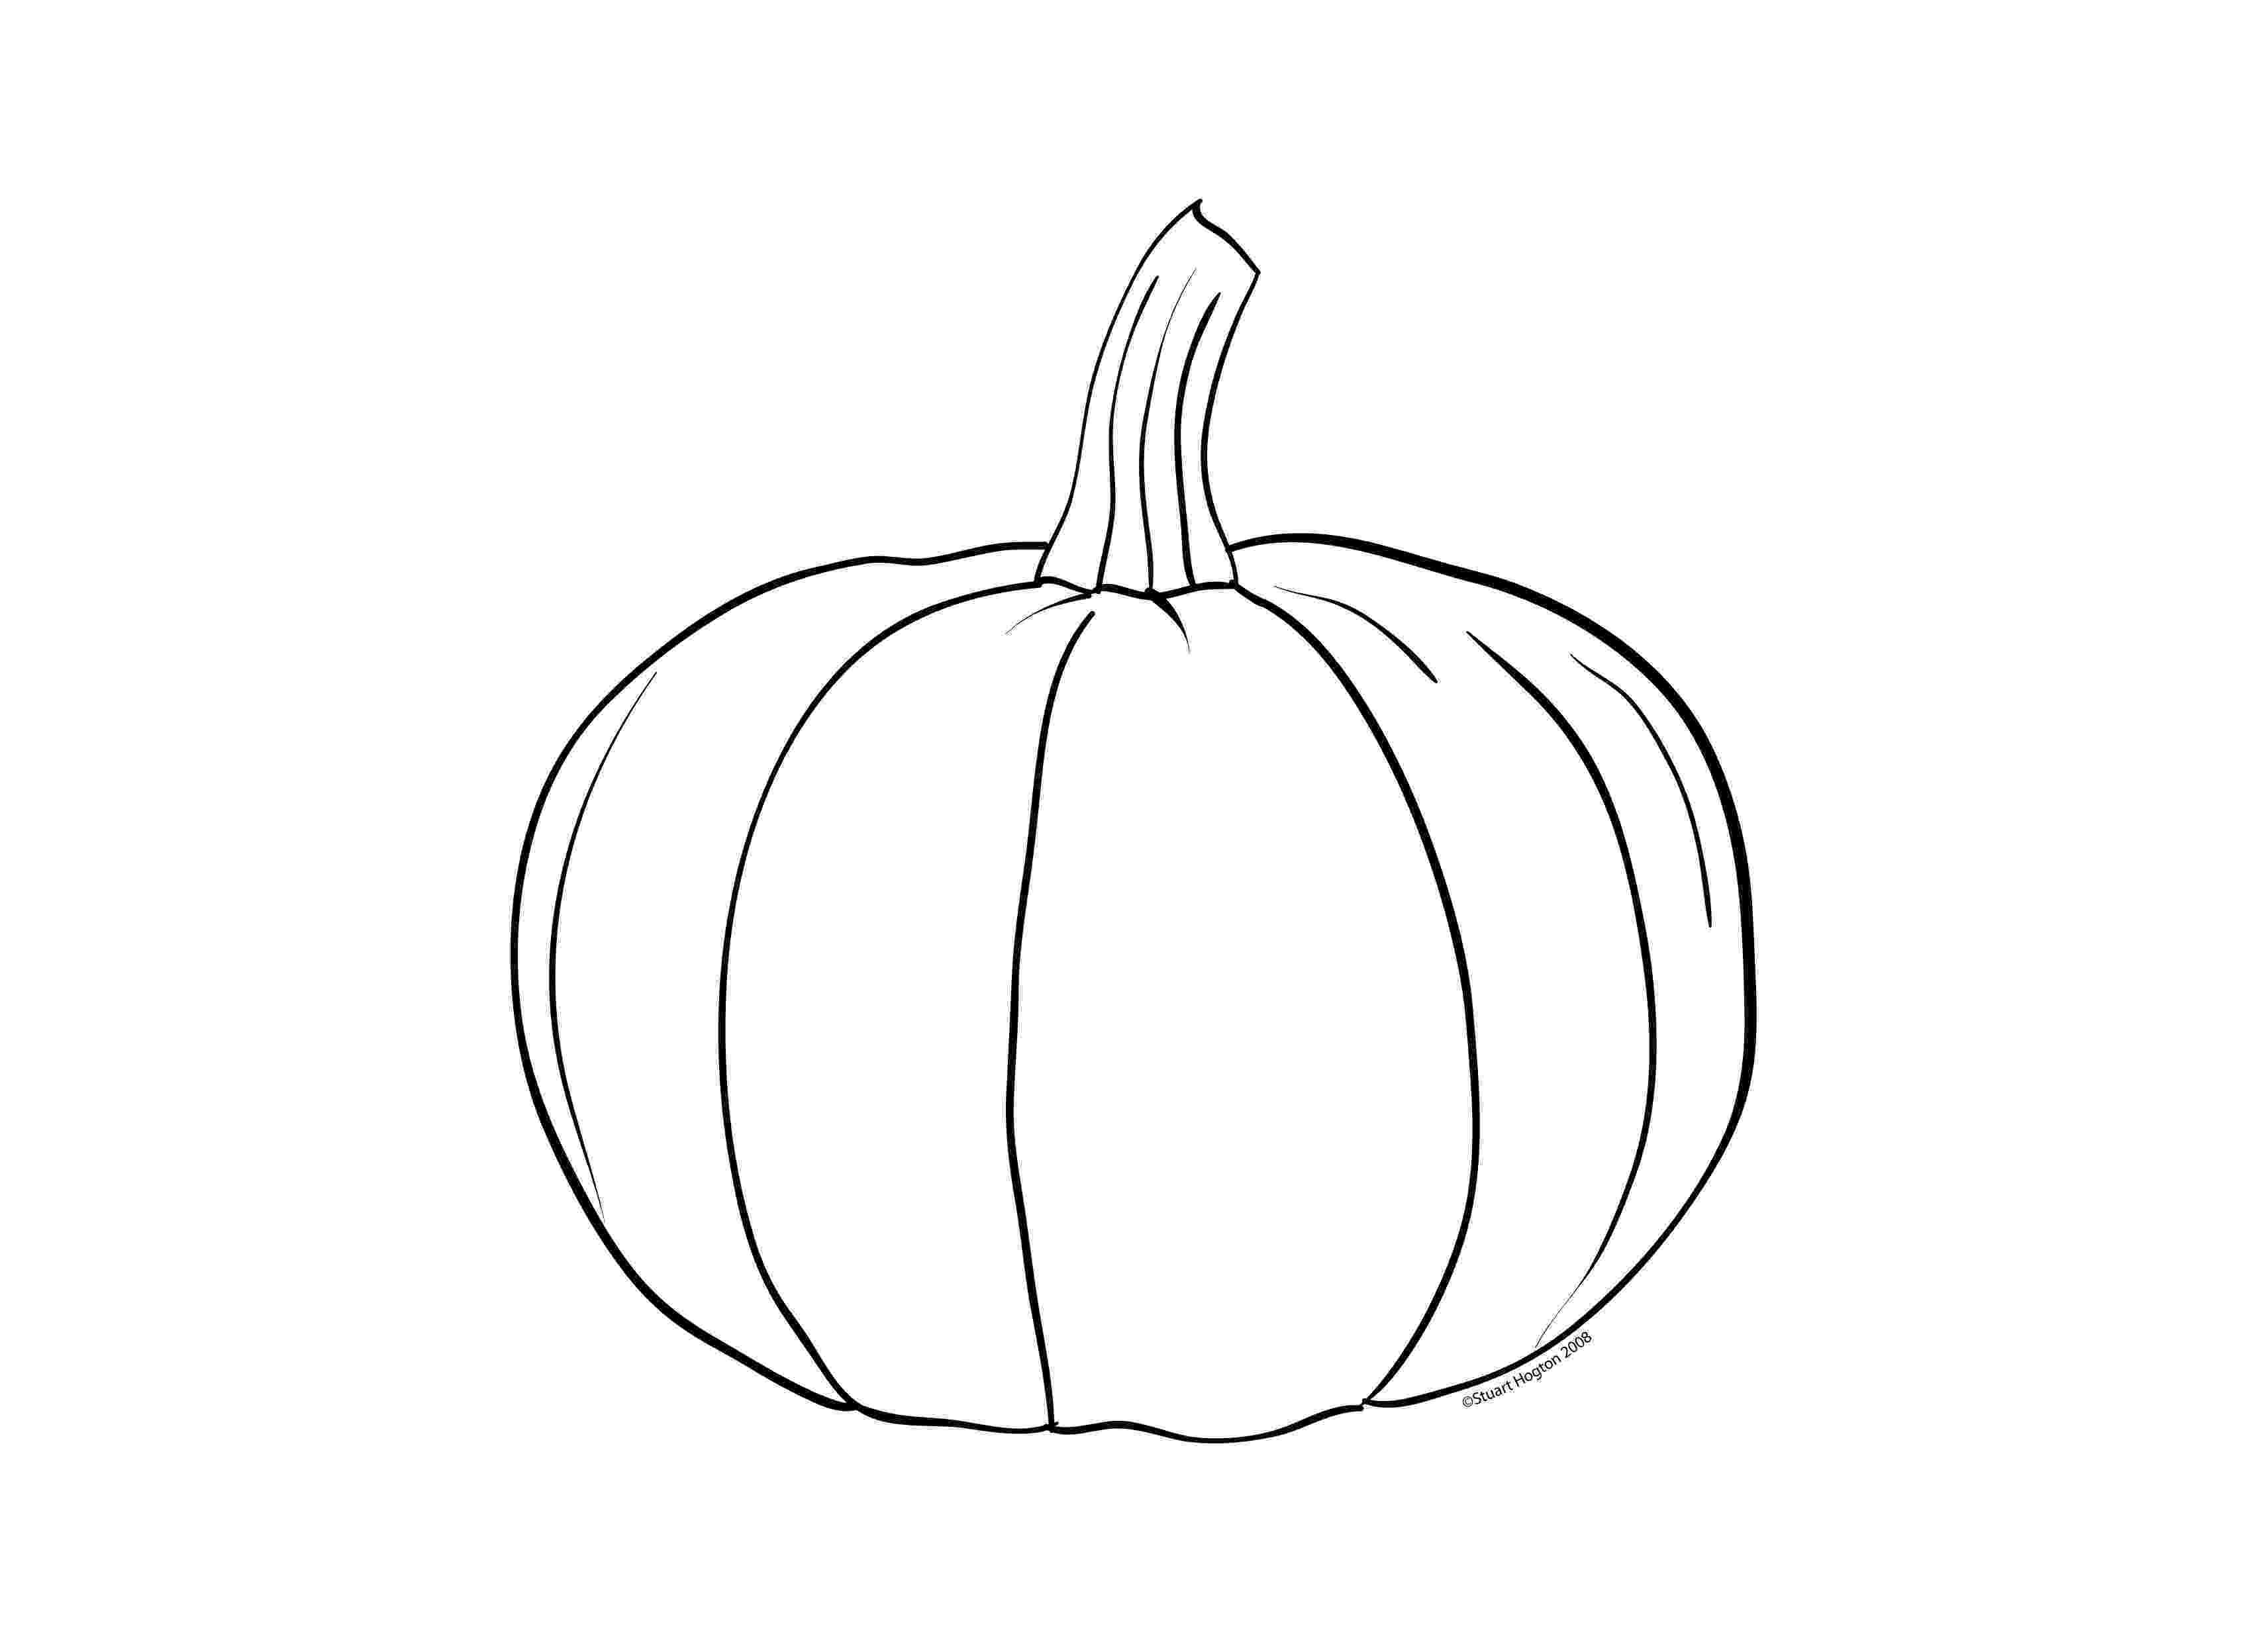 pumpkin color pages printable free printable pumpkin coloring pages for kids cool2bkids printable pages pumpkin color 1 1